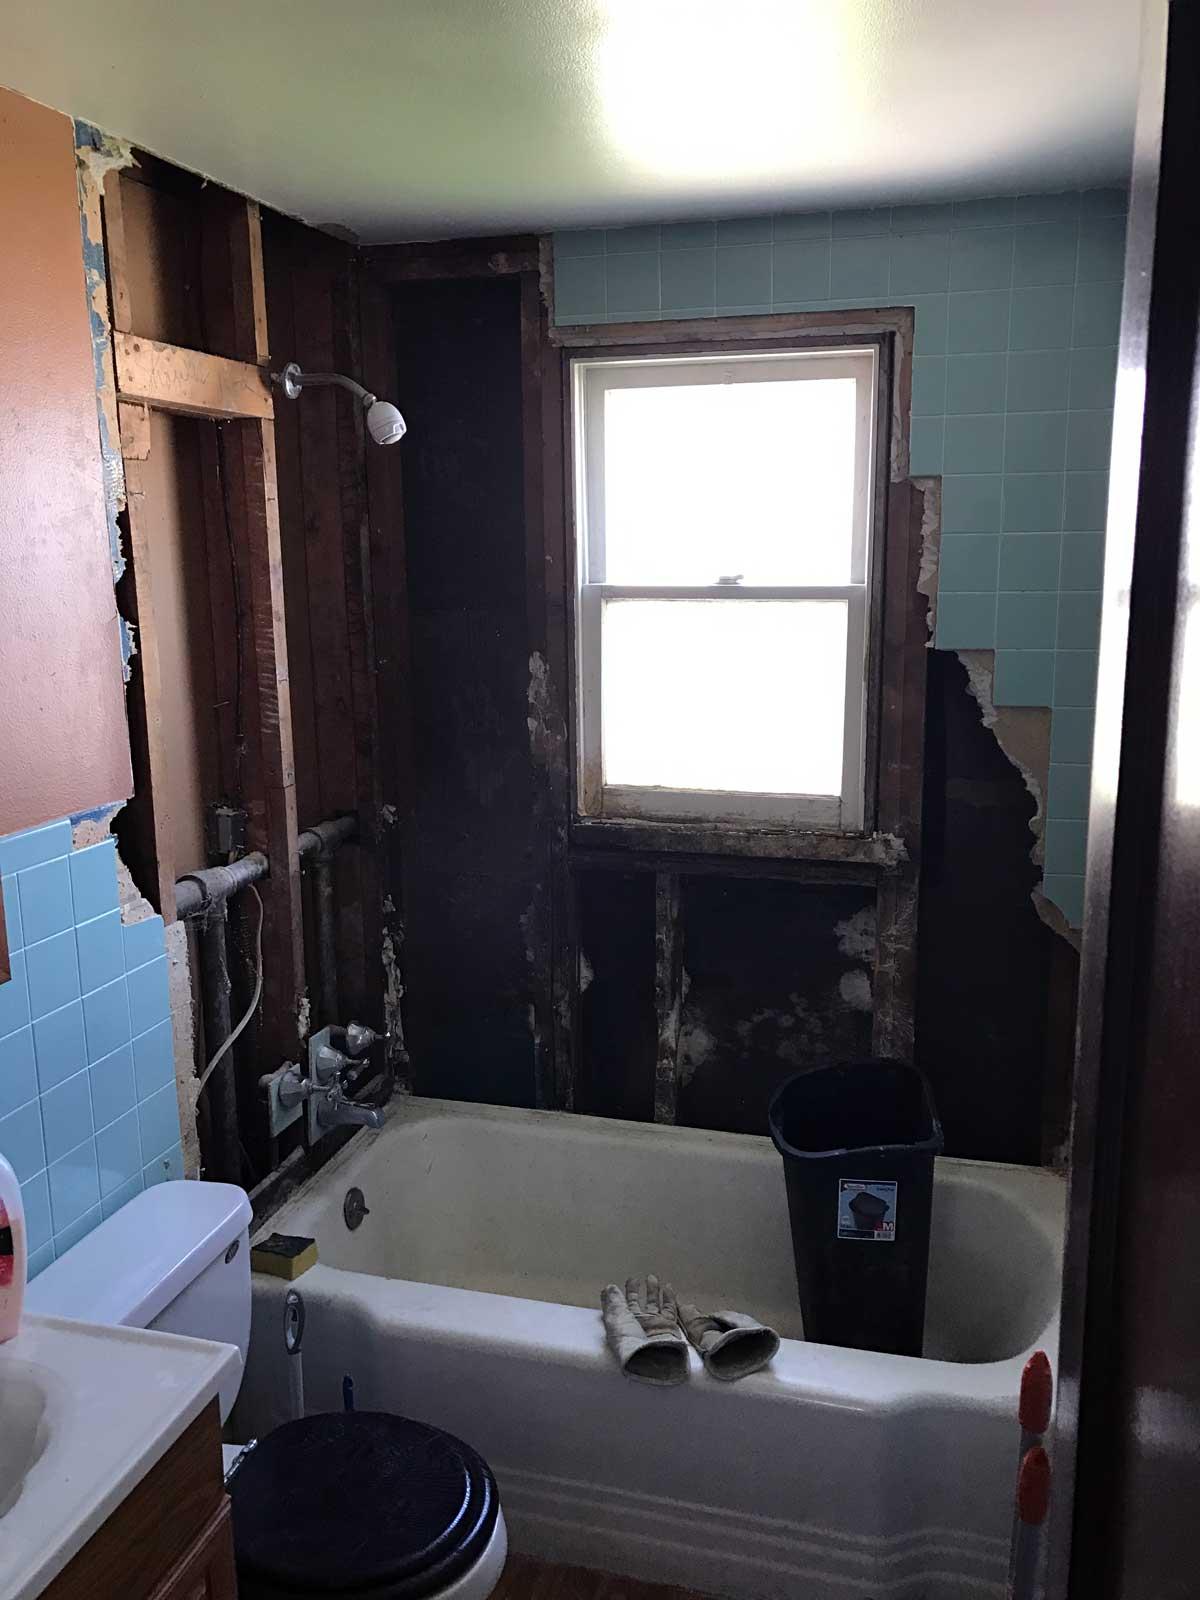 15 Day Bathroom Renovation Demolition 01